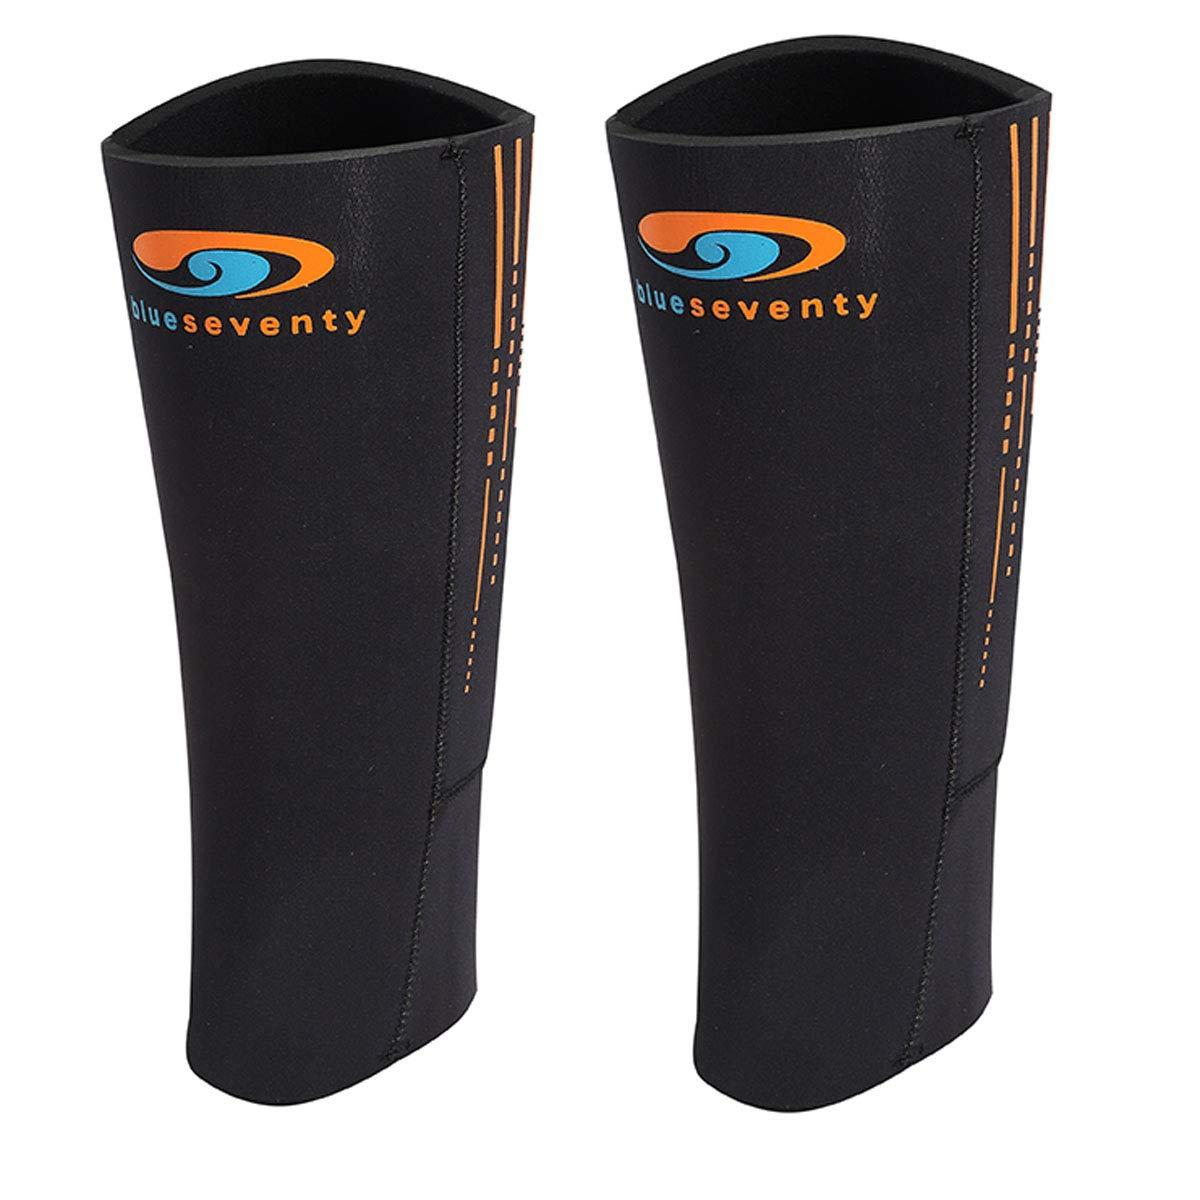 blueseventy SwimRun Calf Sleeves – gain Buoyancy for Your Legs During The Swim portions of Your SwimRun Race